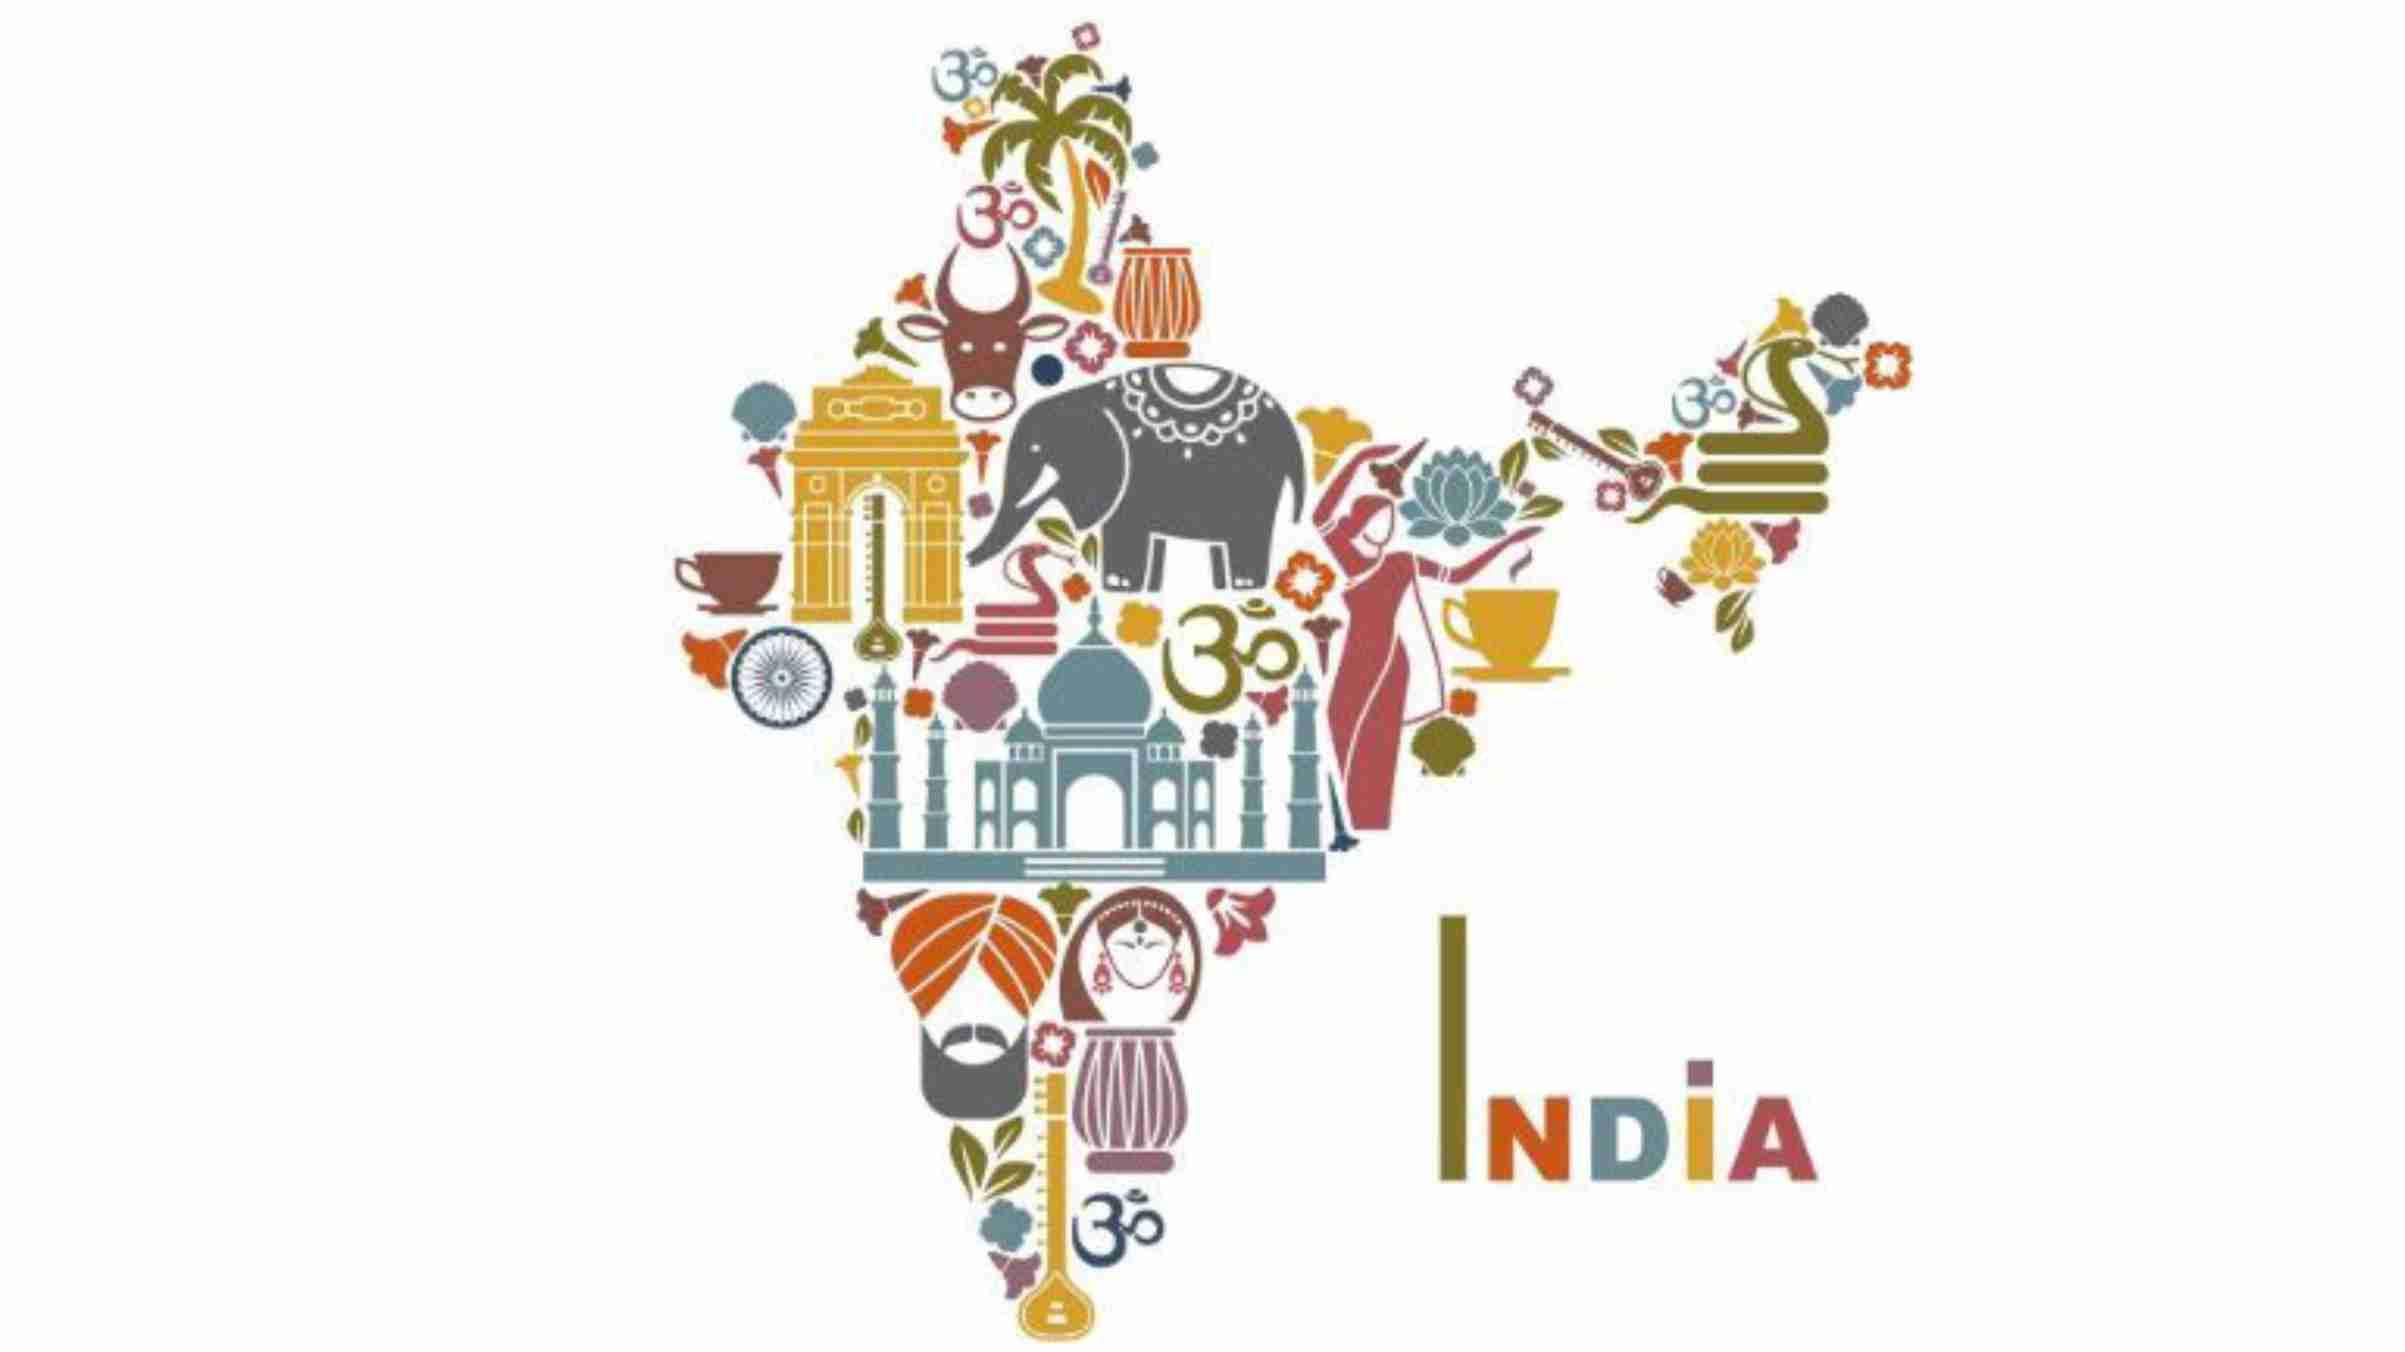 India theme kids activity printable worksheets